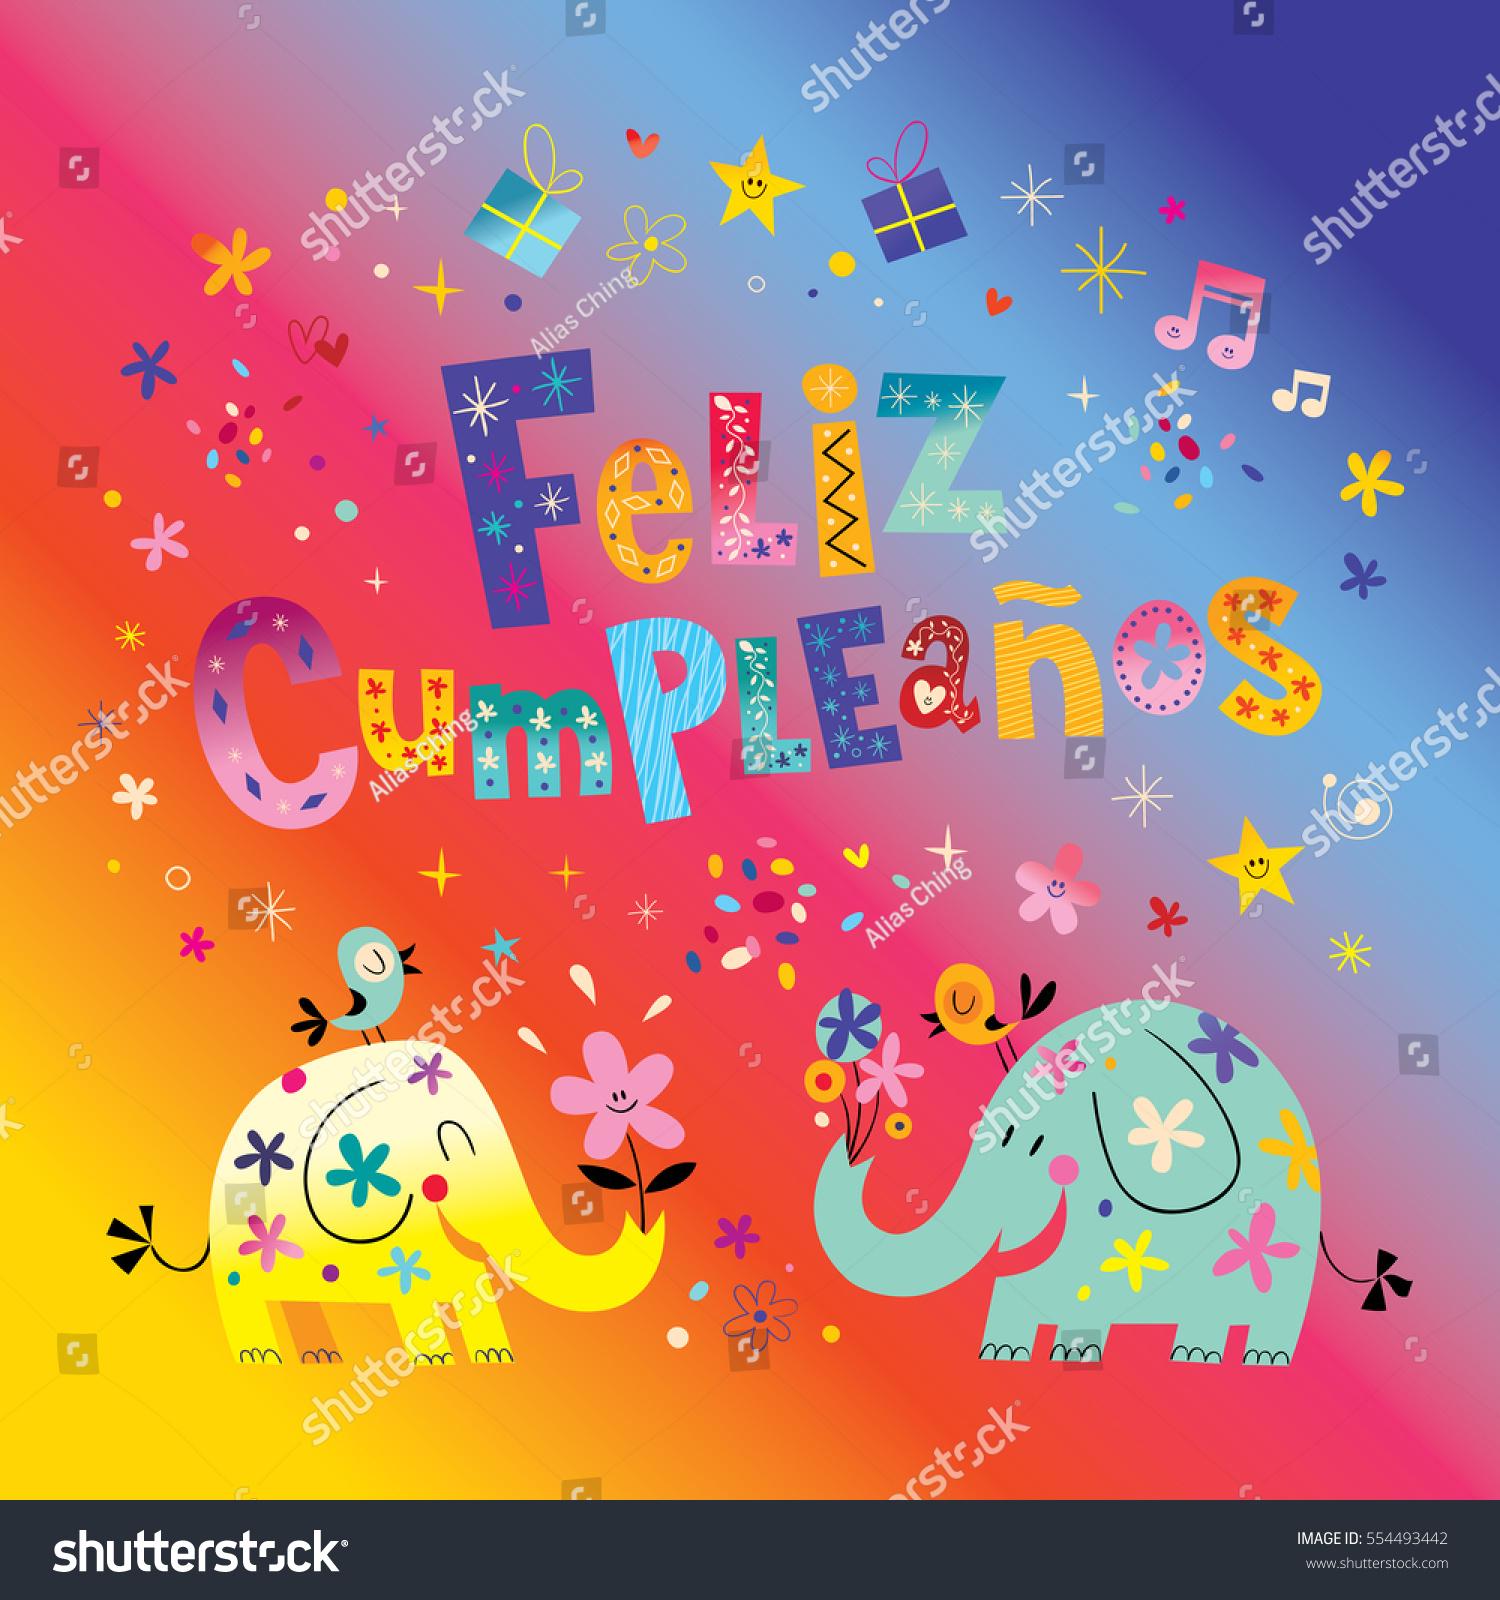 New happy birthday cards in spanish pictures eccleshallfc feliz cumpleanos happy birthday spanish greeting stock vector bookmarktalkfo Images